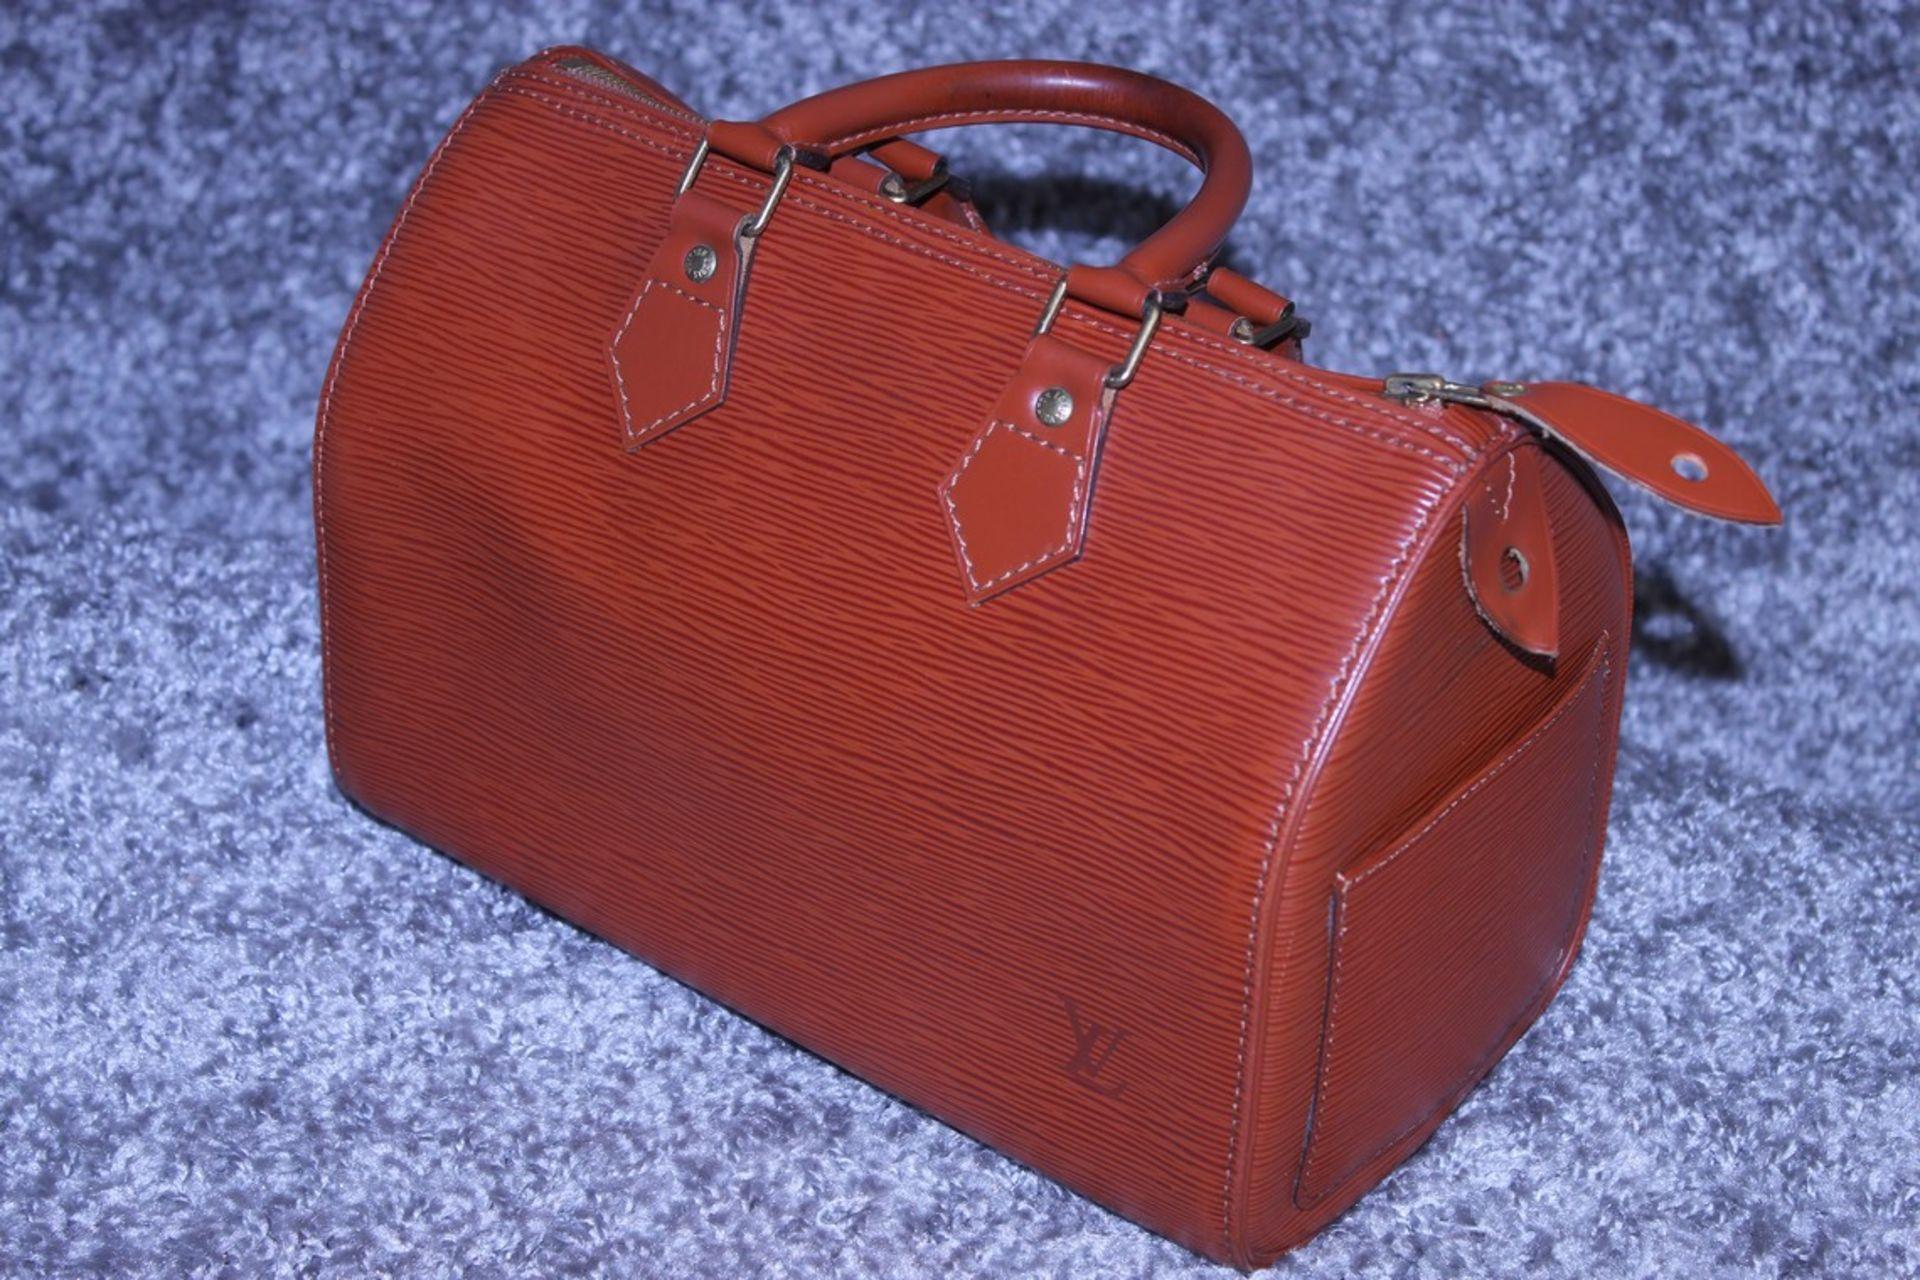 RRP £1,000 Louis Vuitton Speedy 25 Handbag, Tan Epi Calf Leather 27X19X15Cm (Production Code Vi1922) - Image 3 of 4